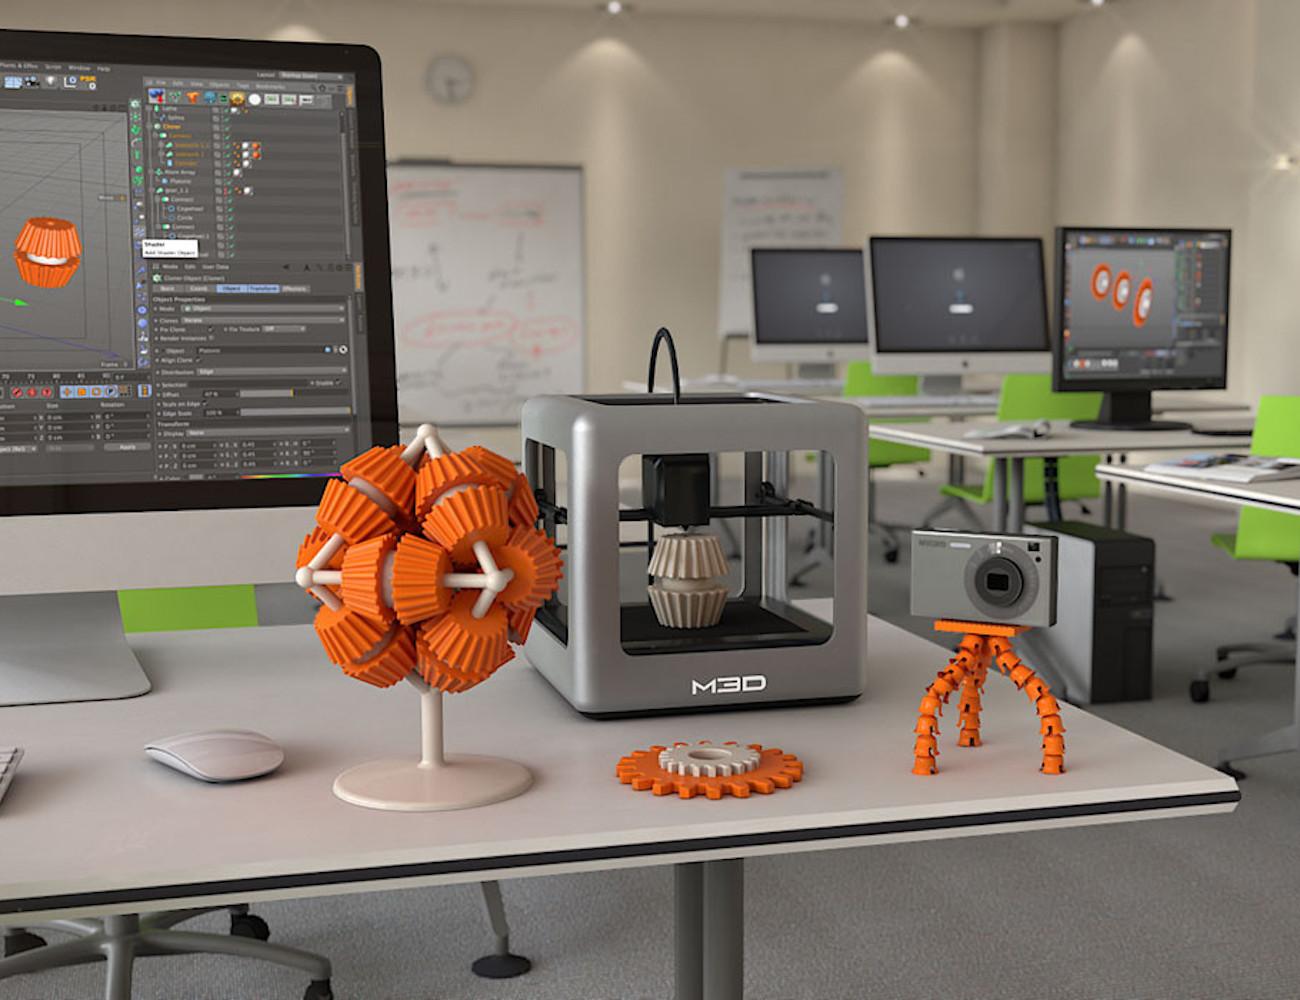 The+Micro+3D+Printer